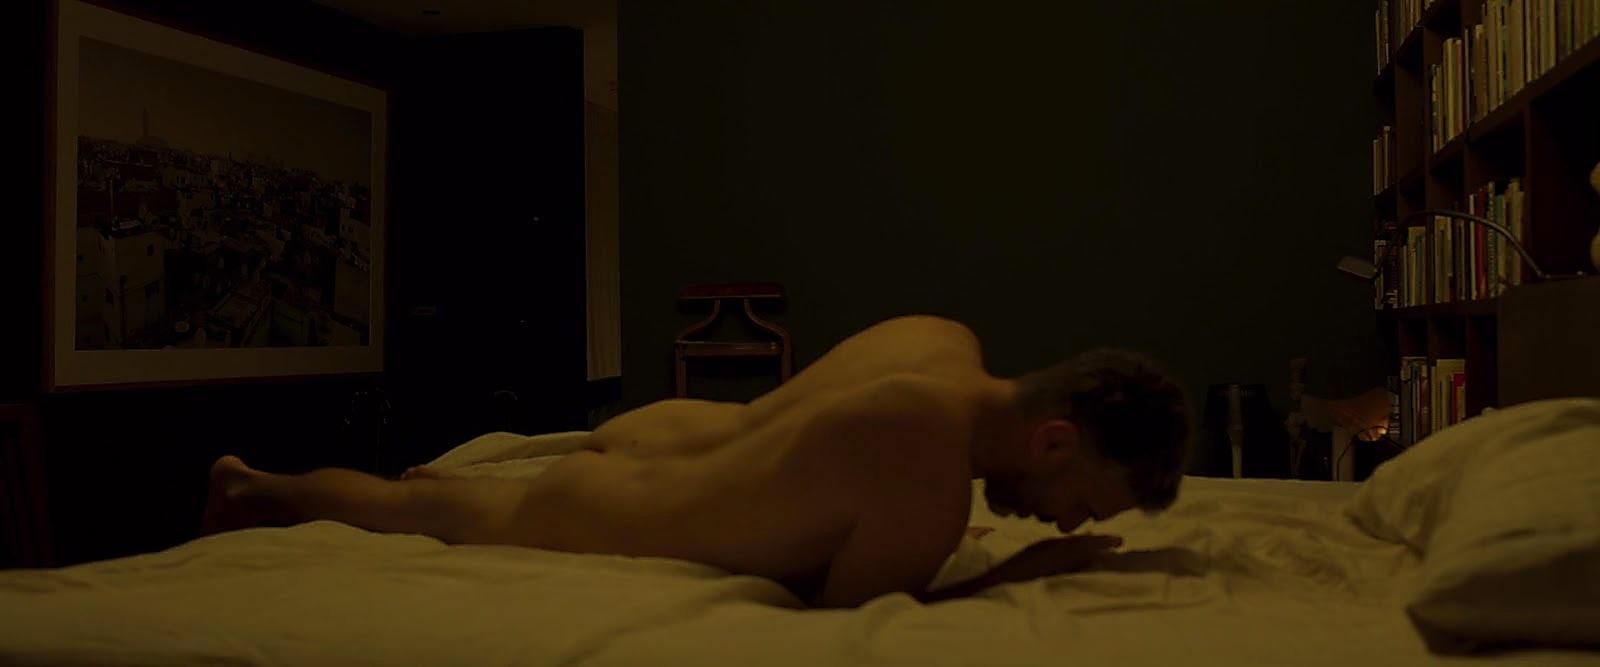 Leonardo Sbaraglia sexy shirtless scene July 27, 2020, 11am